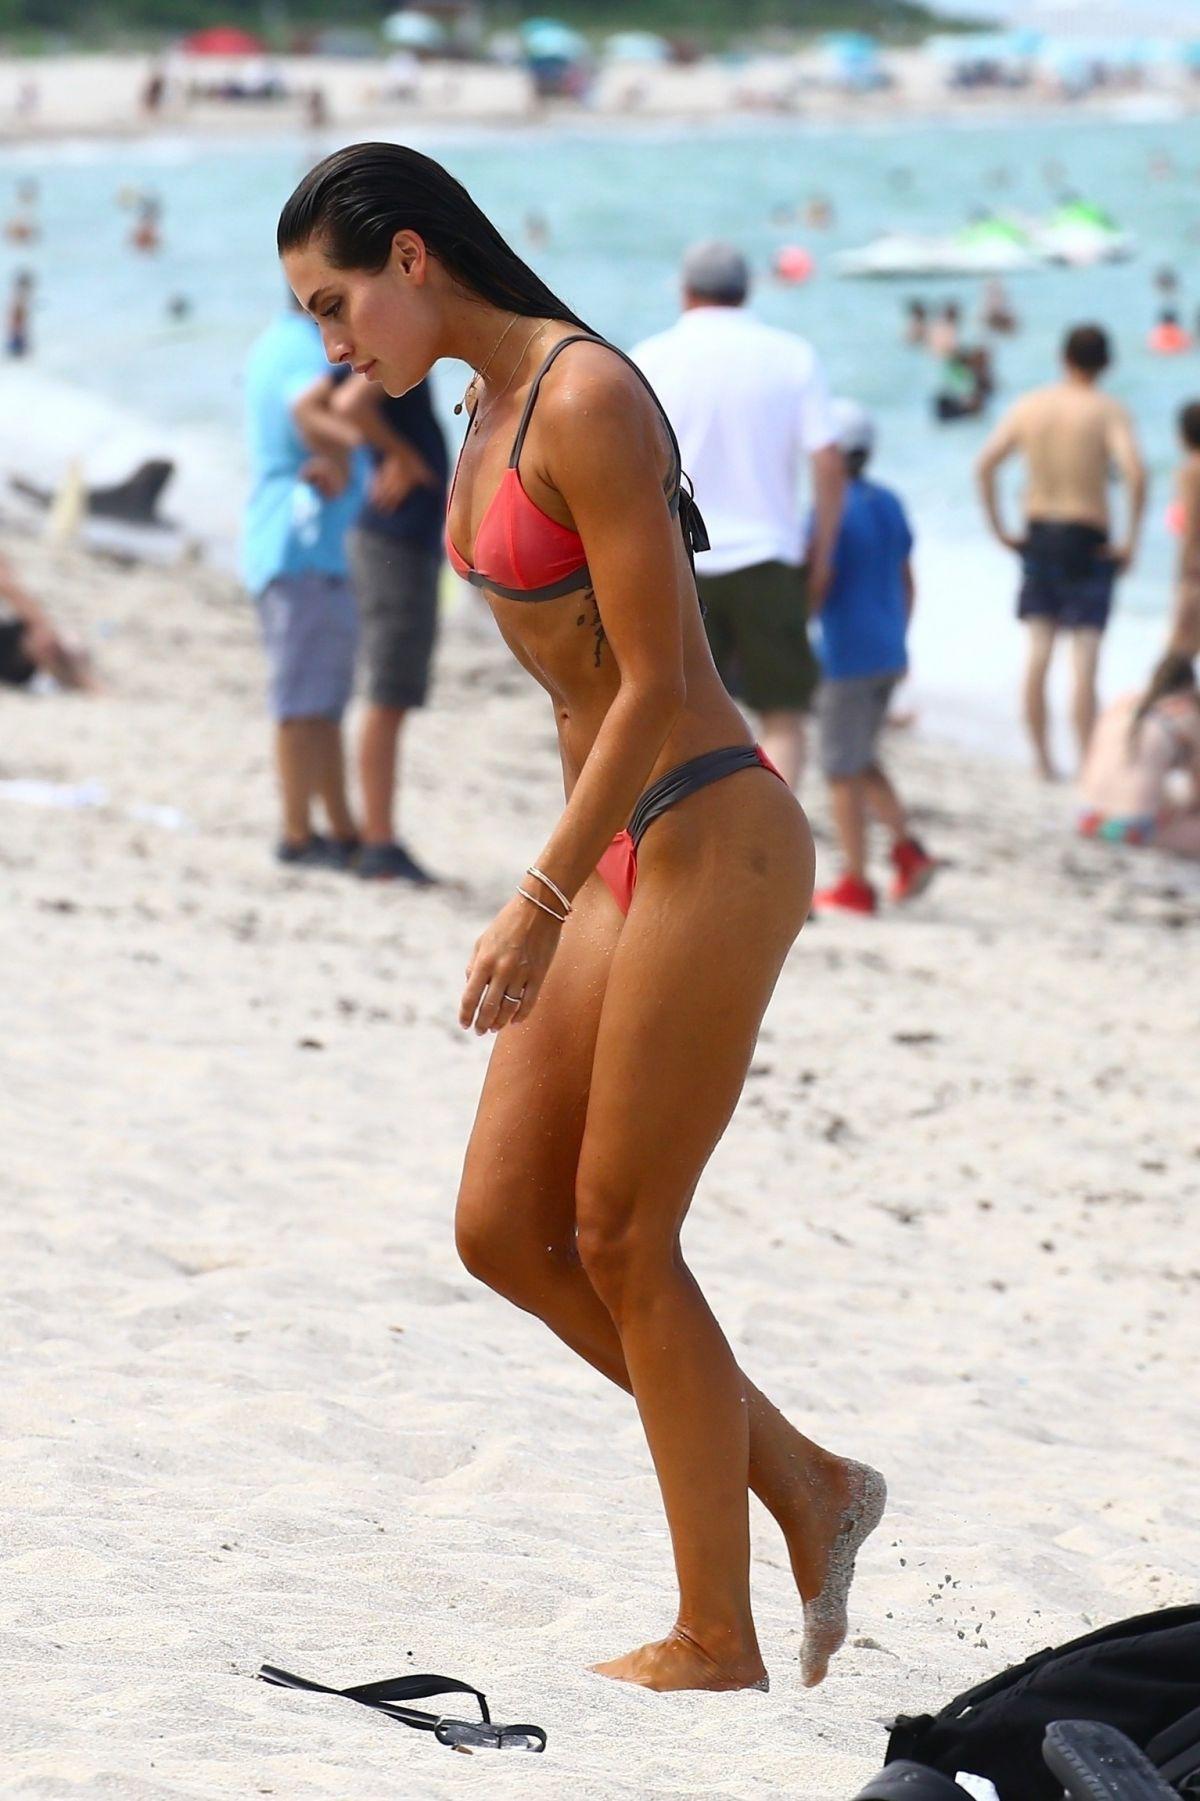 Bikini Kaylee Ricciardi nudes (98 foto and video), Topless, Is a cute, Feet, legs 2019